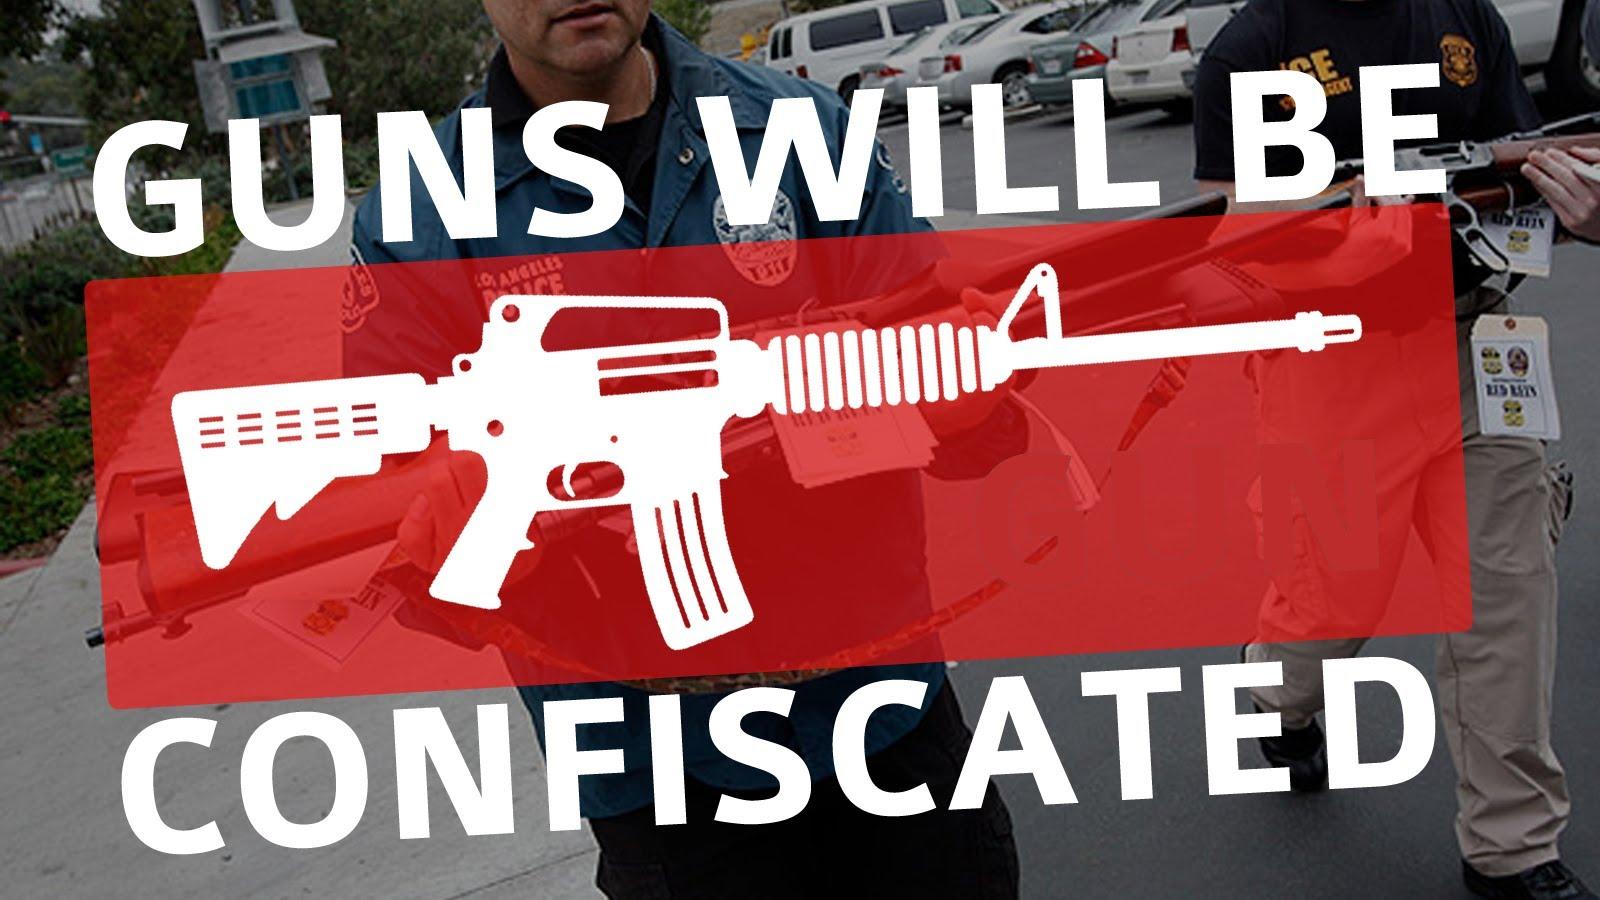 gun control, america, gun confiscated